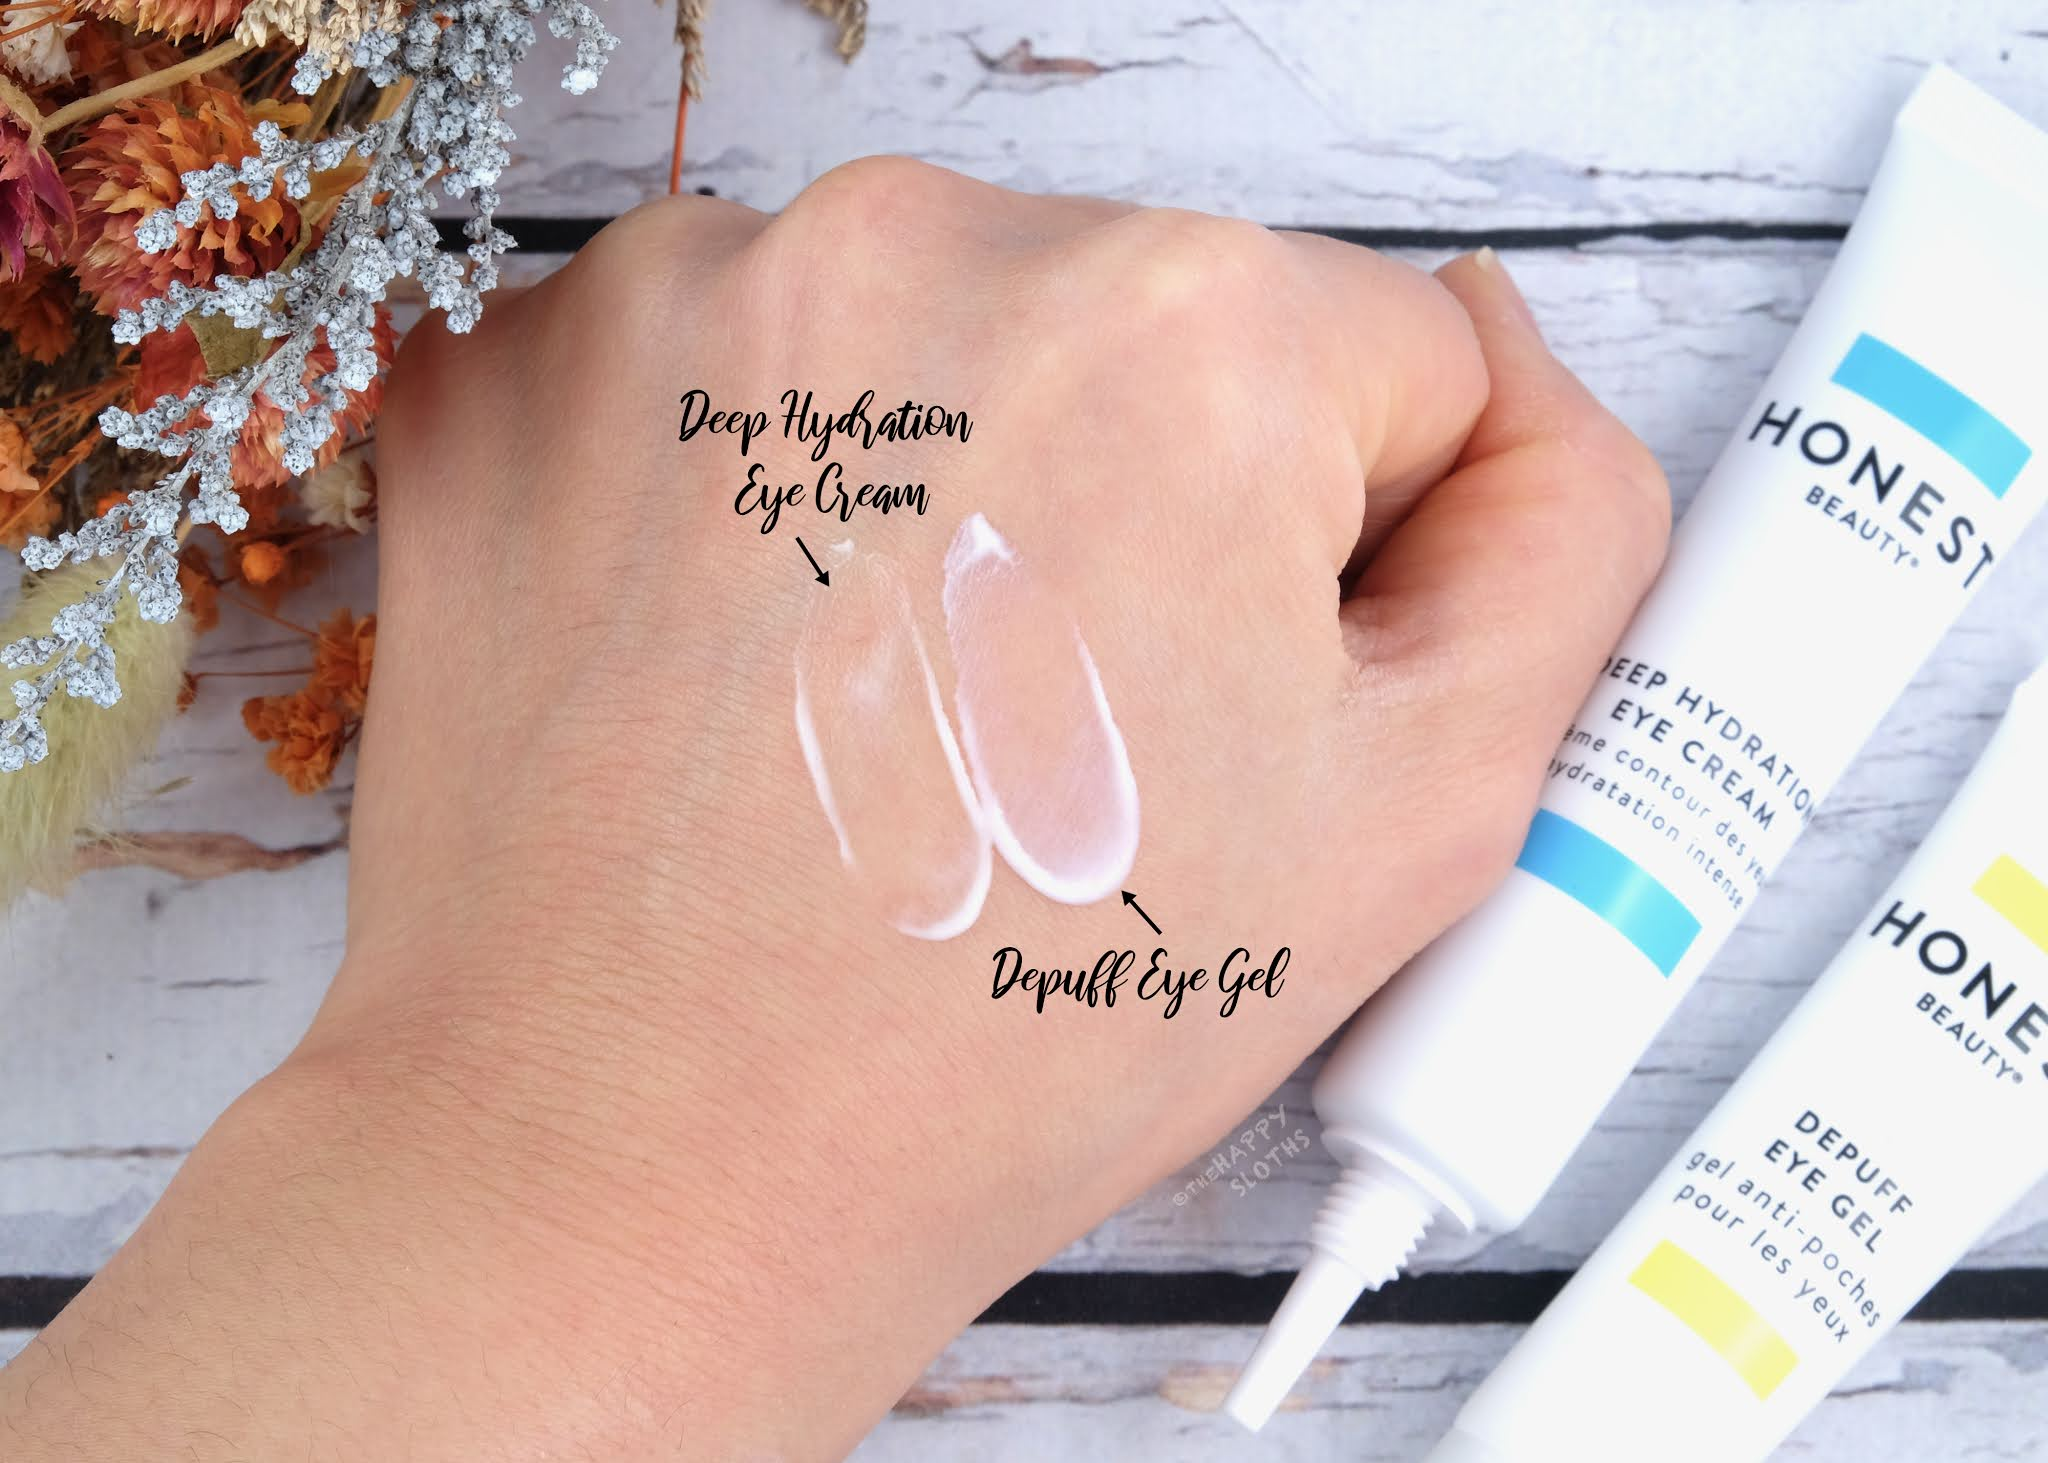 Honest Beauty | Deep Hydration Eye Cream & Depuff Eye Gel: Review